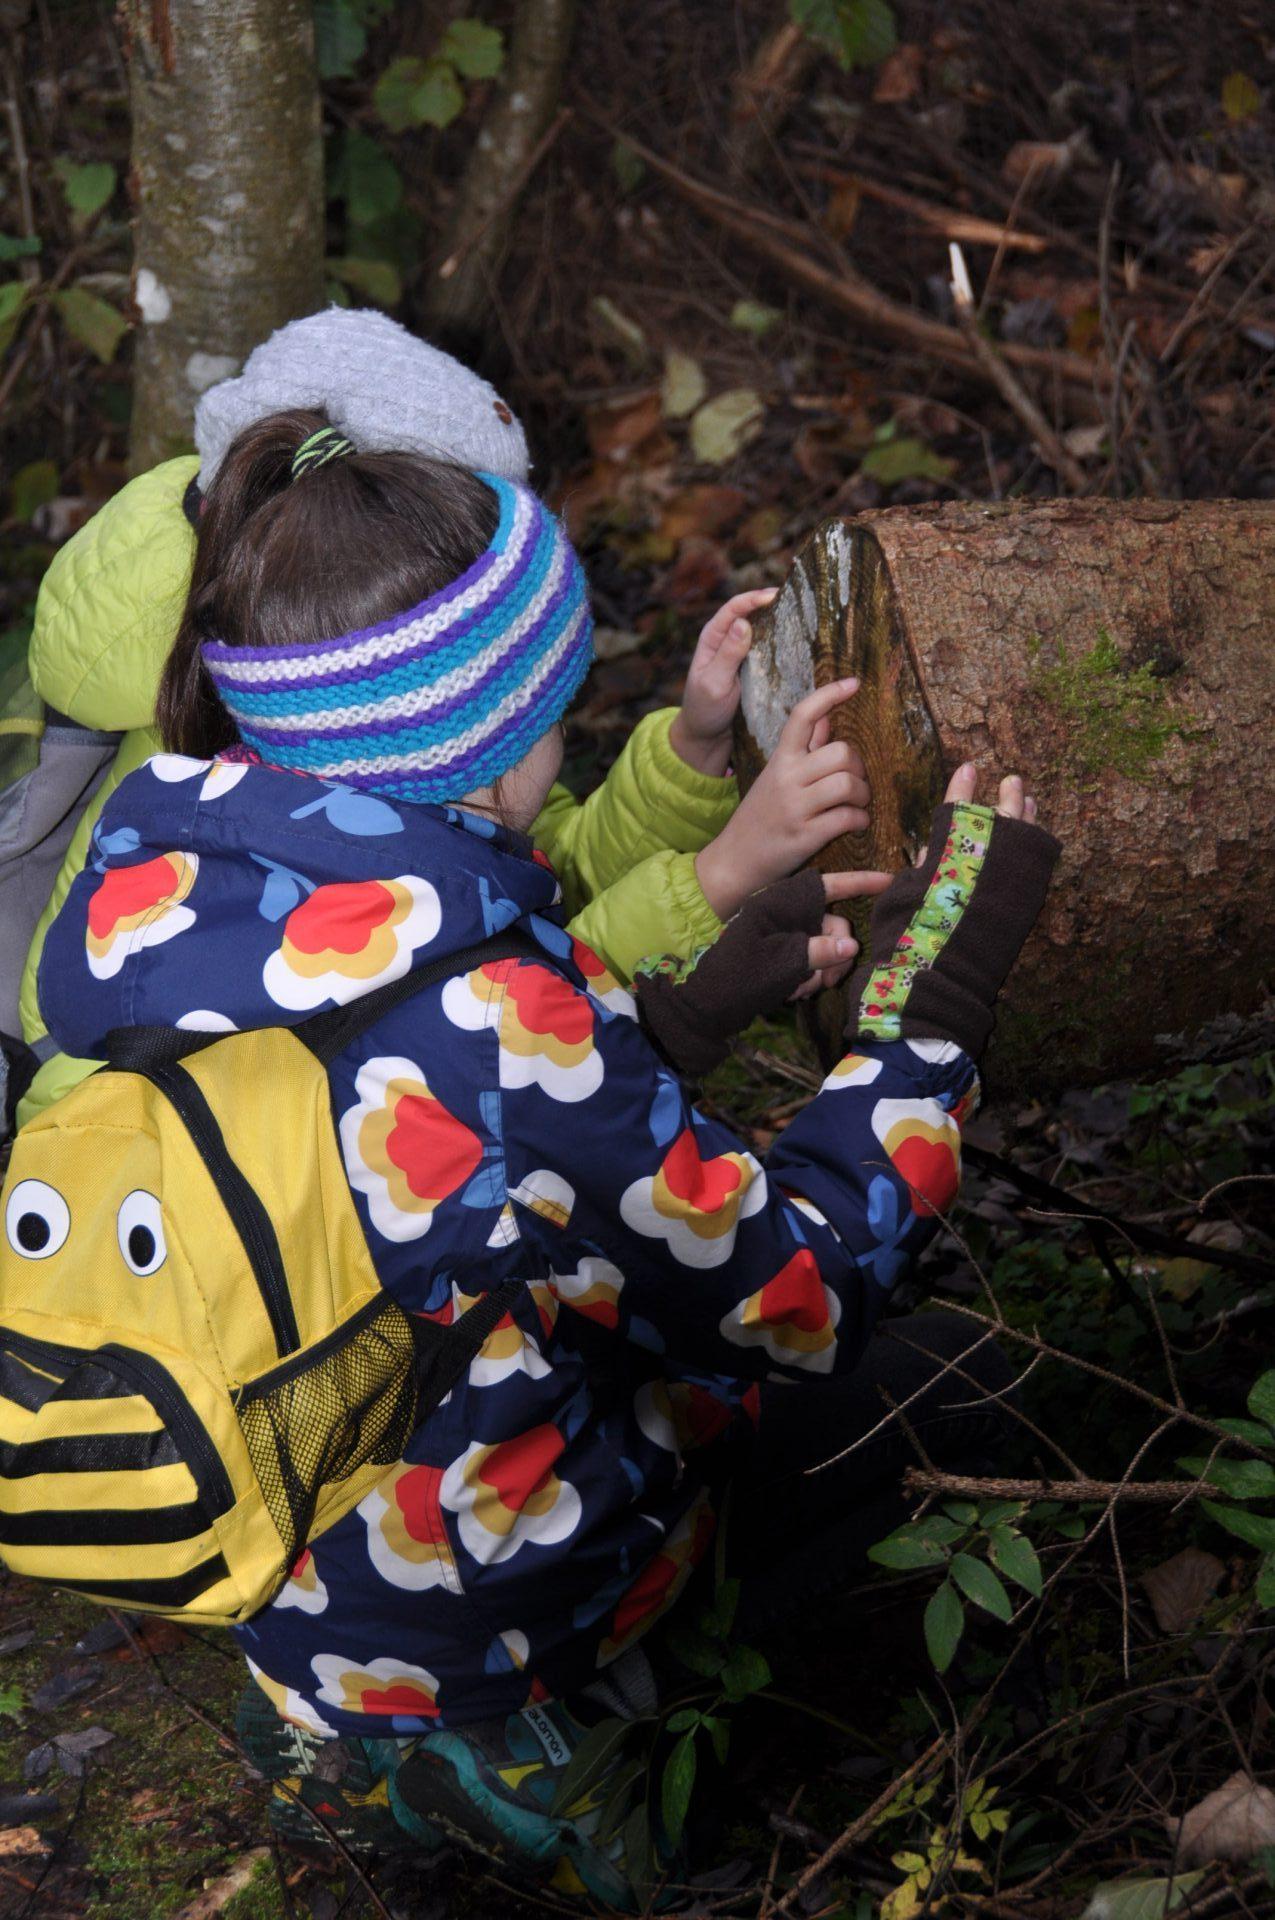 Lerngang in den Herbstwald